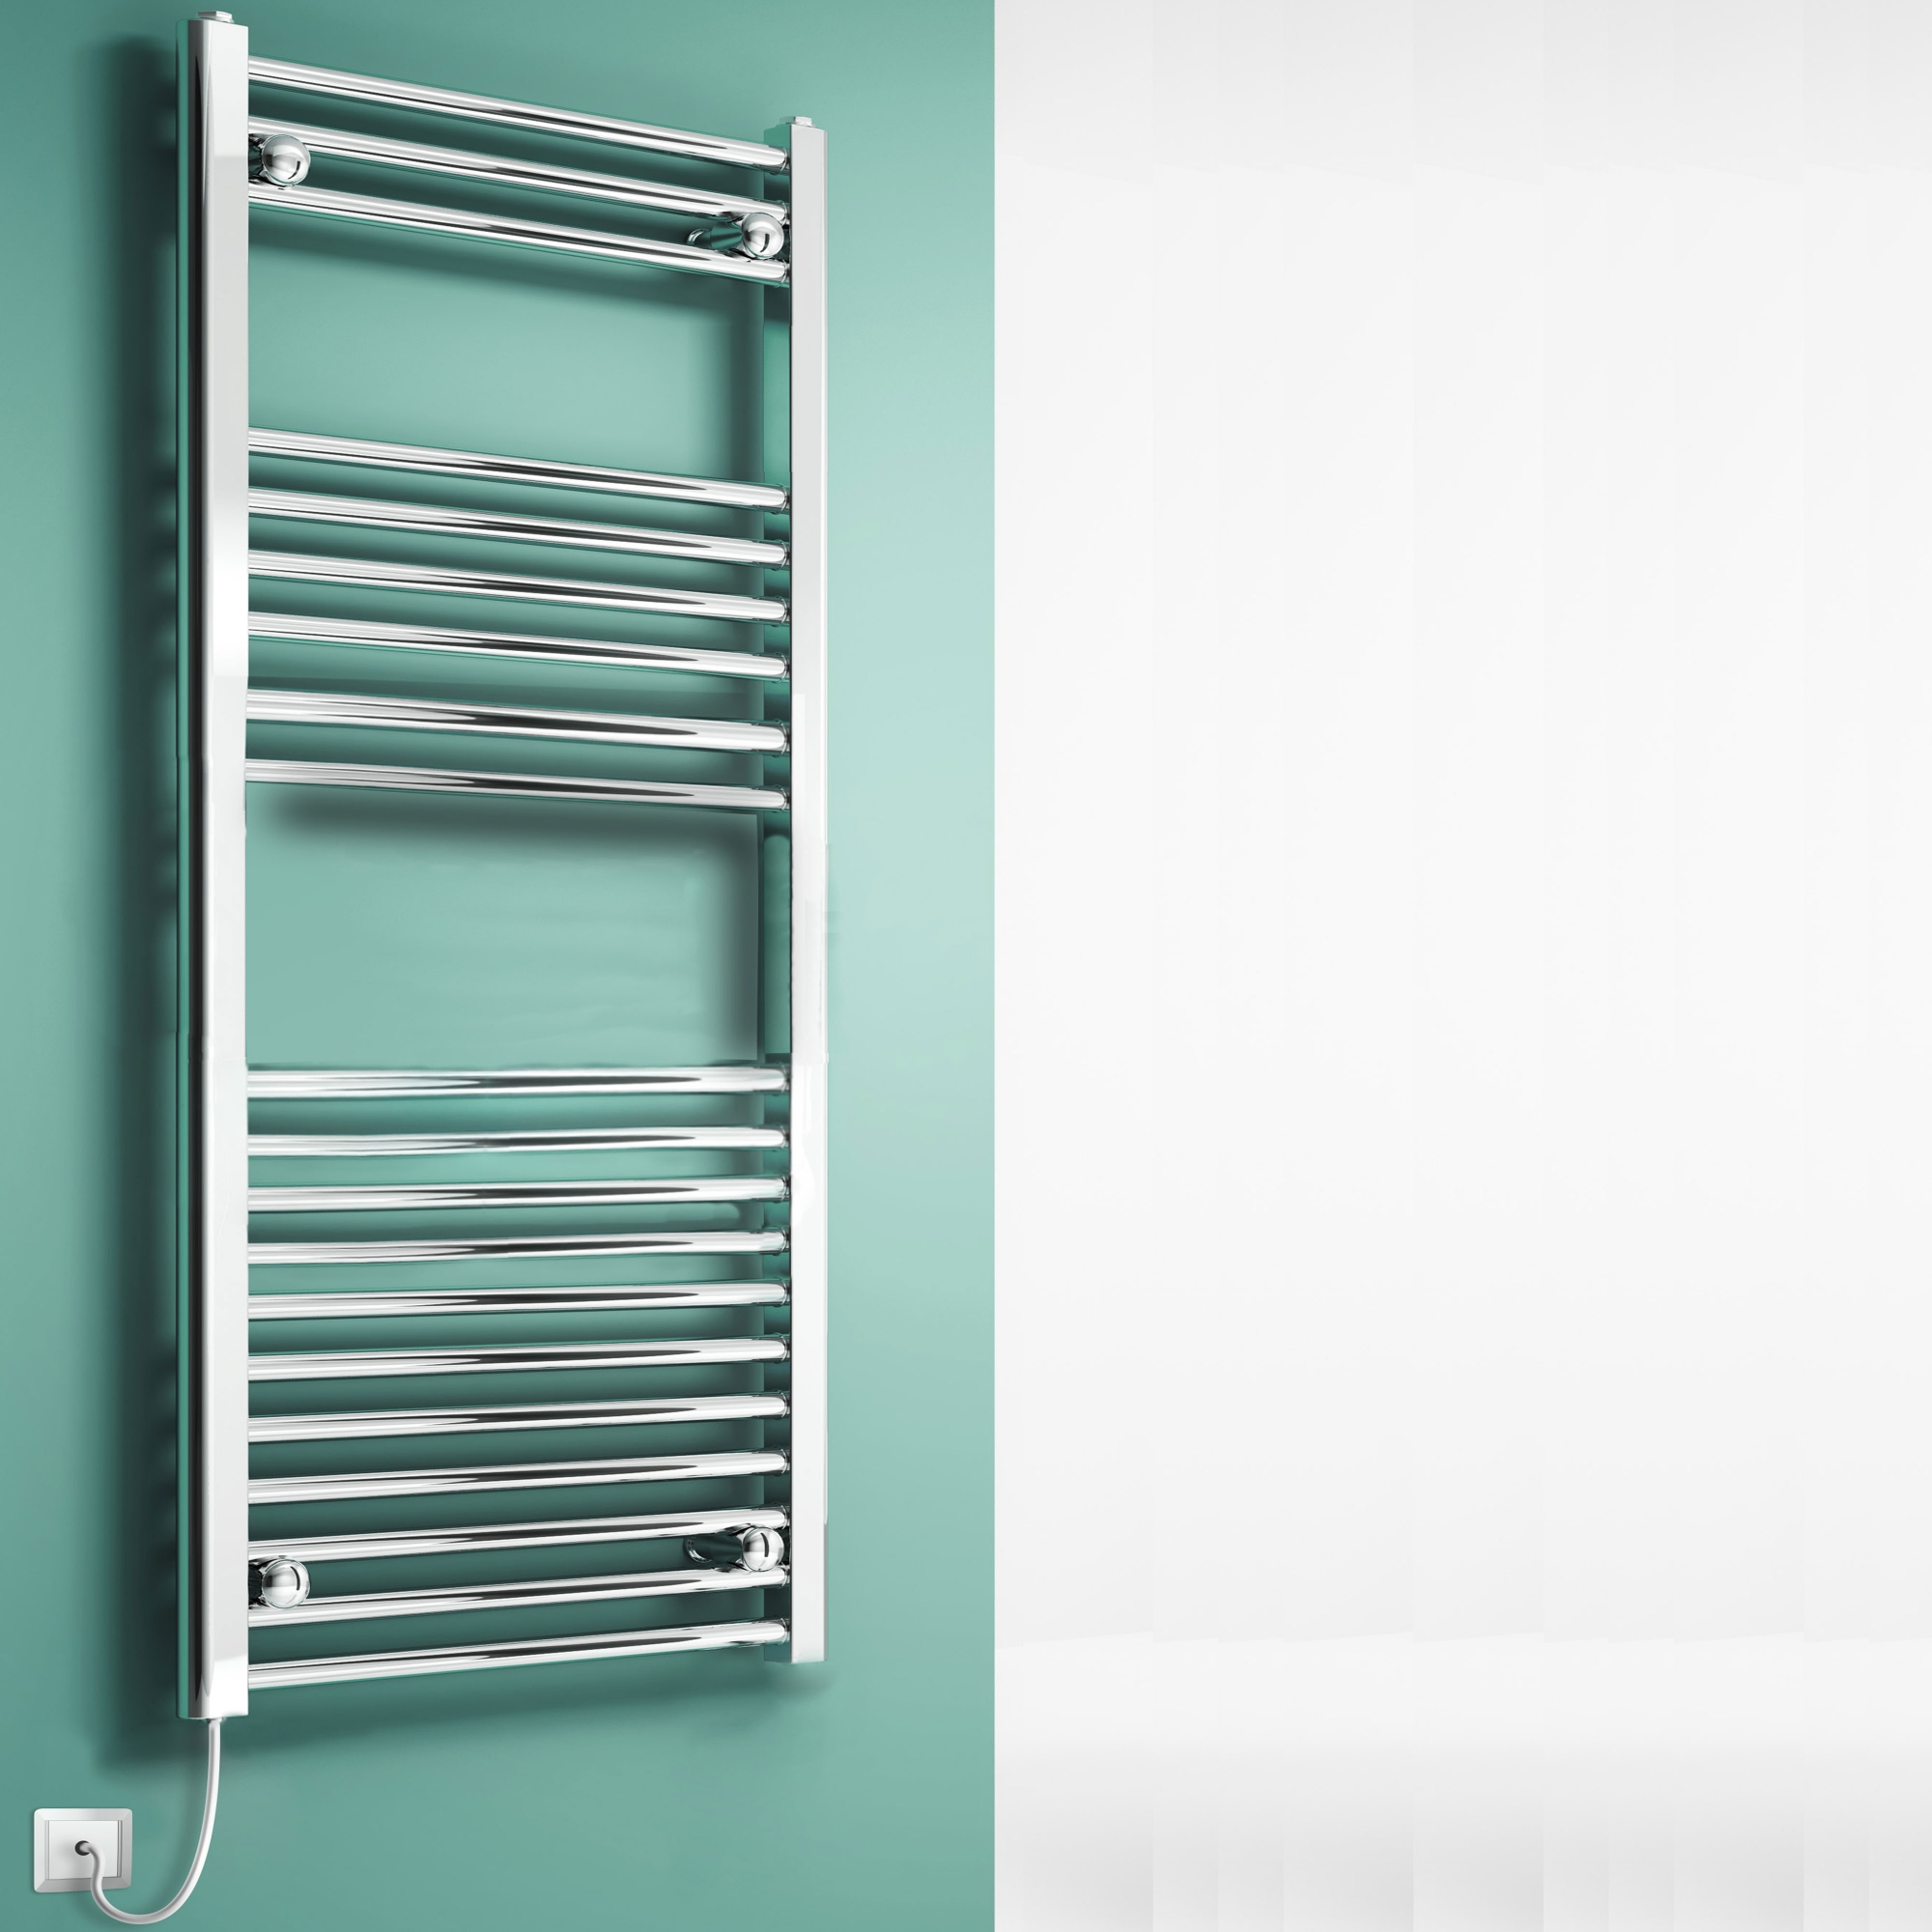 Reina Eross Dry Electric Heated Towel Rail 750mm H x 600mm W